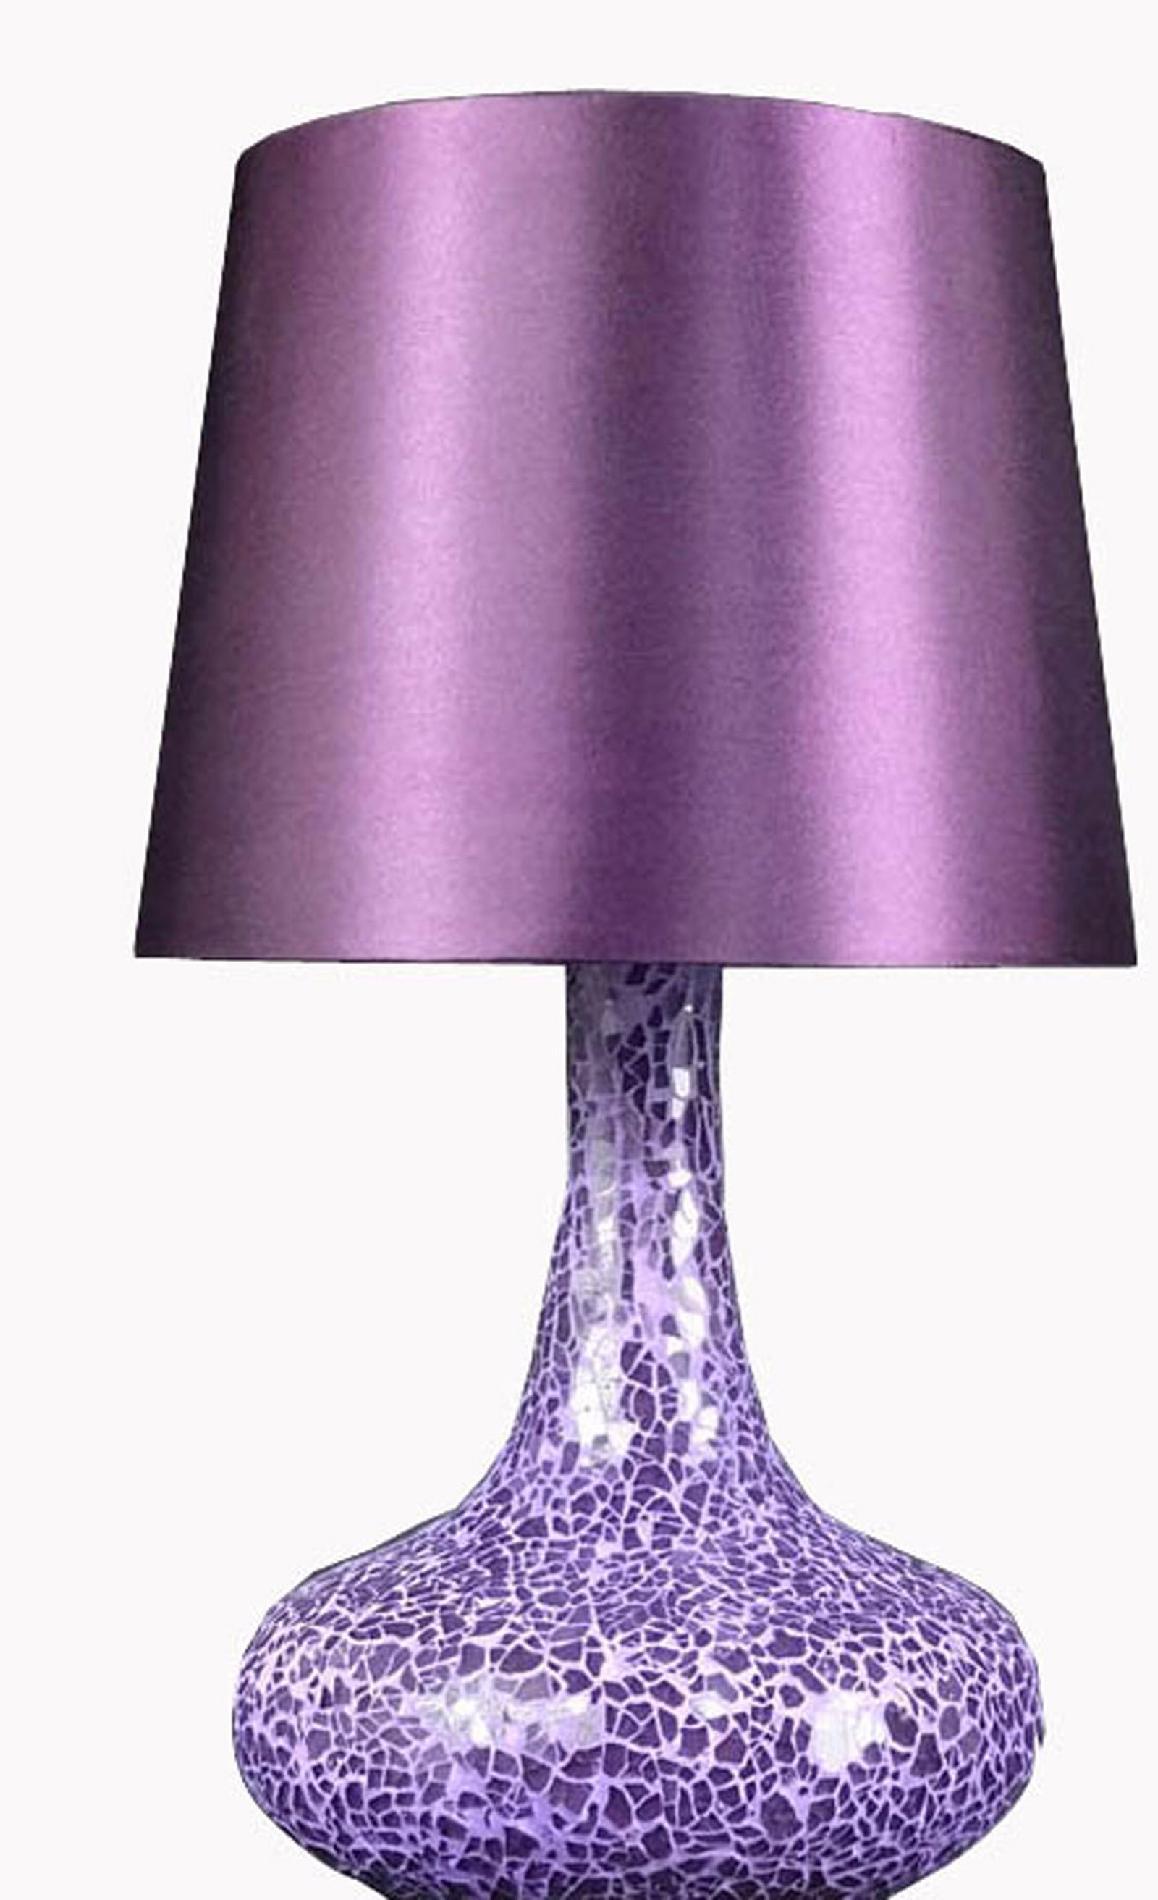 Glass Lamp Shades Ireland Image Of Purple Lamp Shade